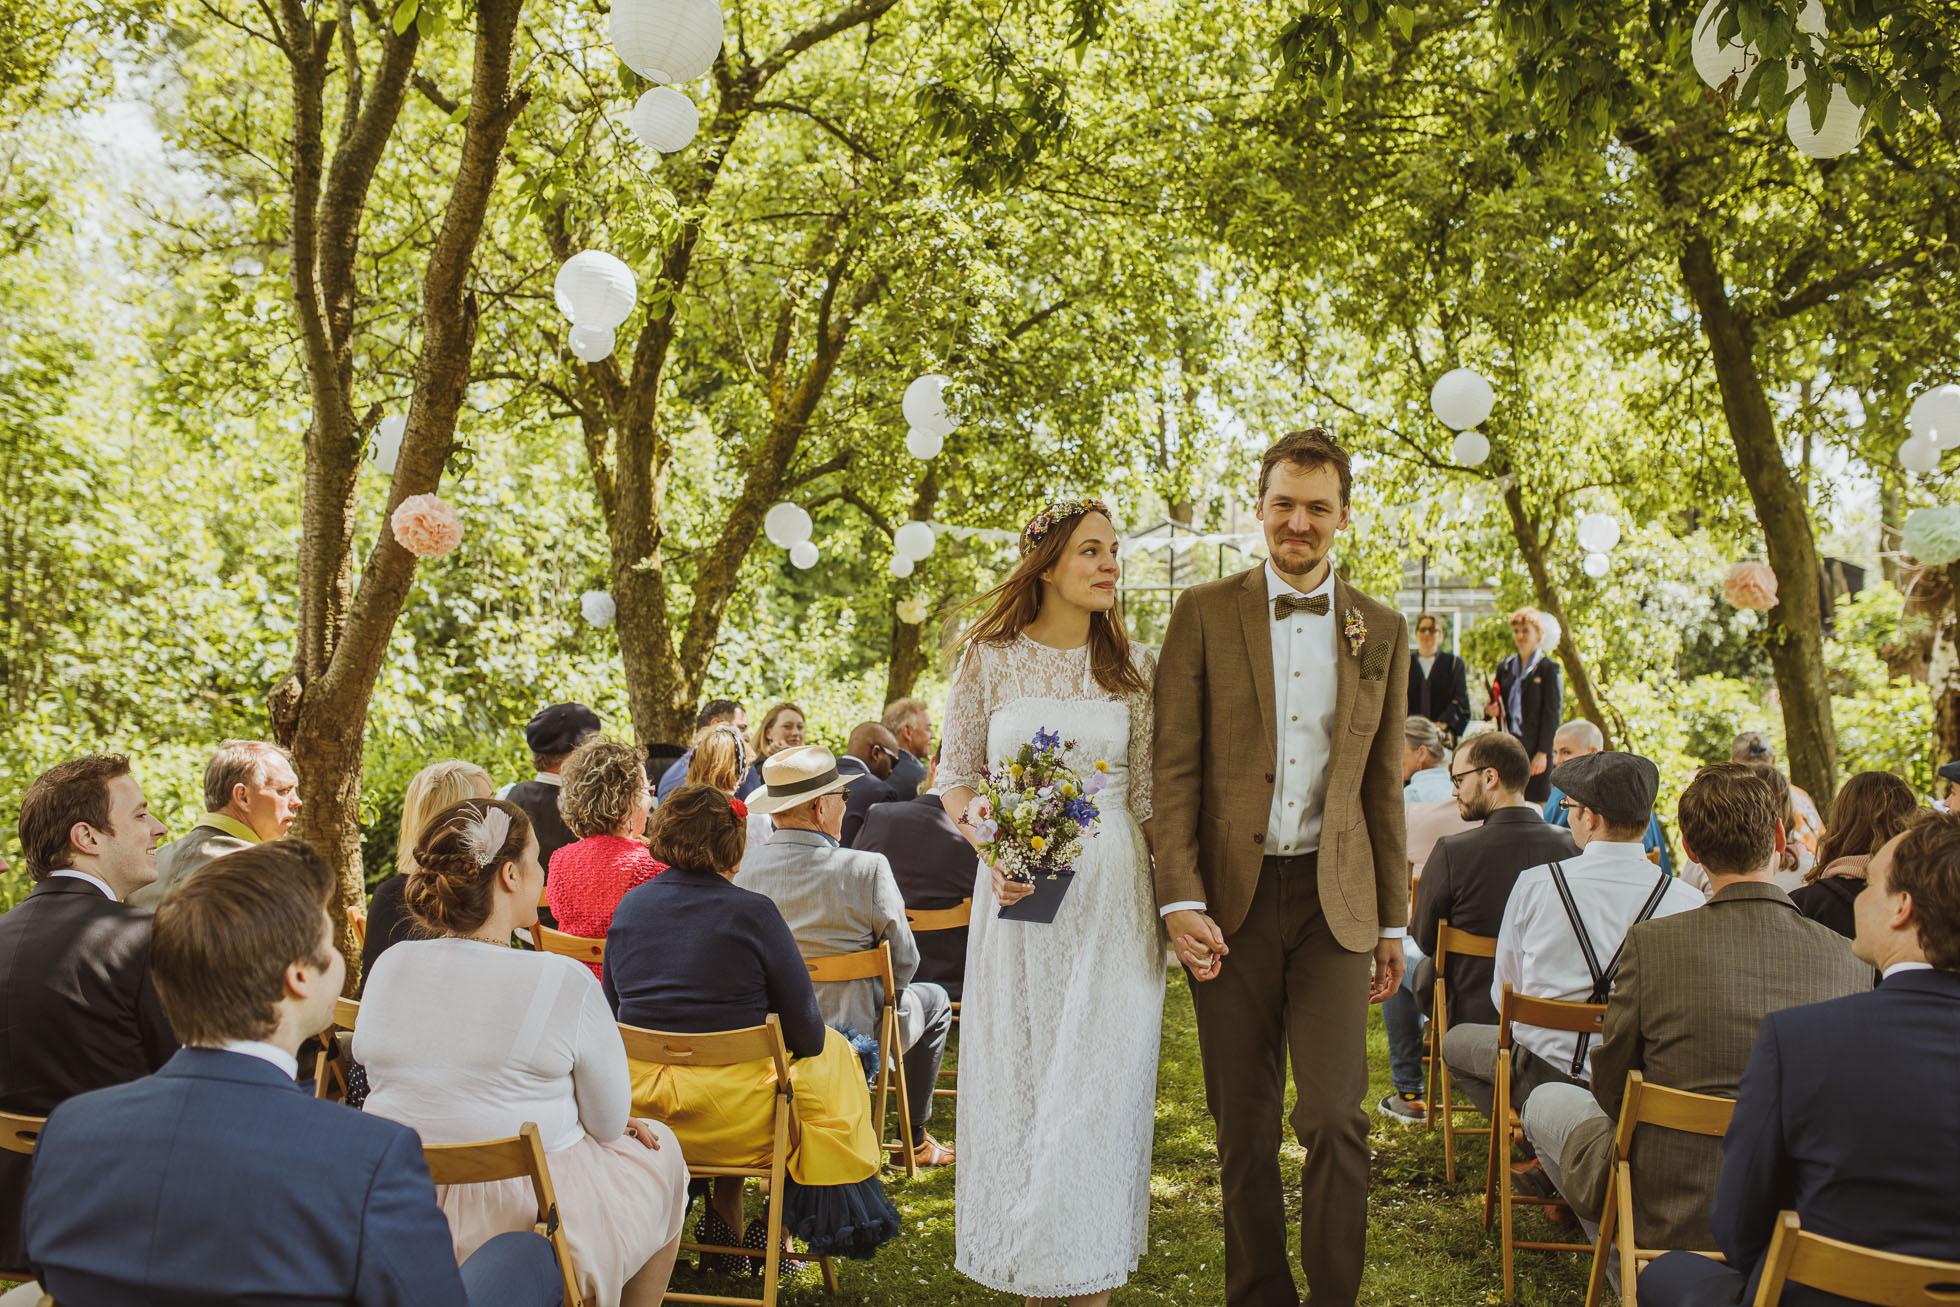 utrecht-wedding-photographer-73.jpg